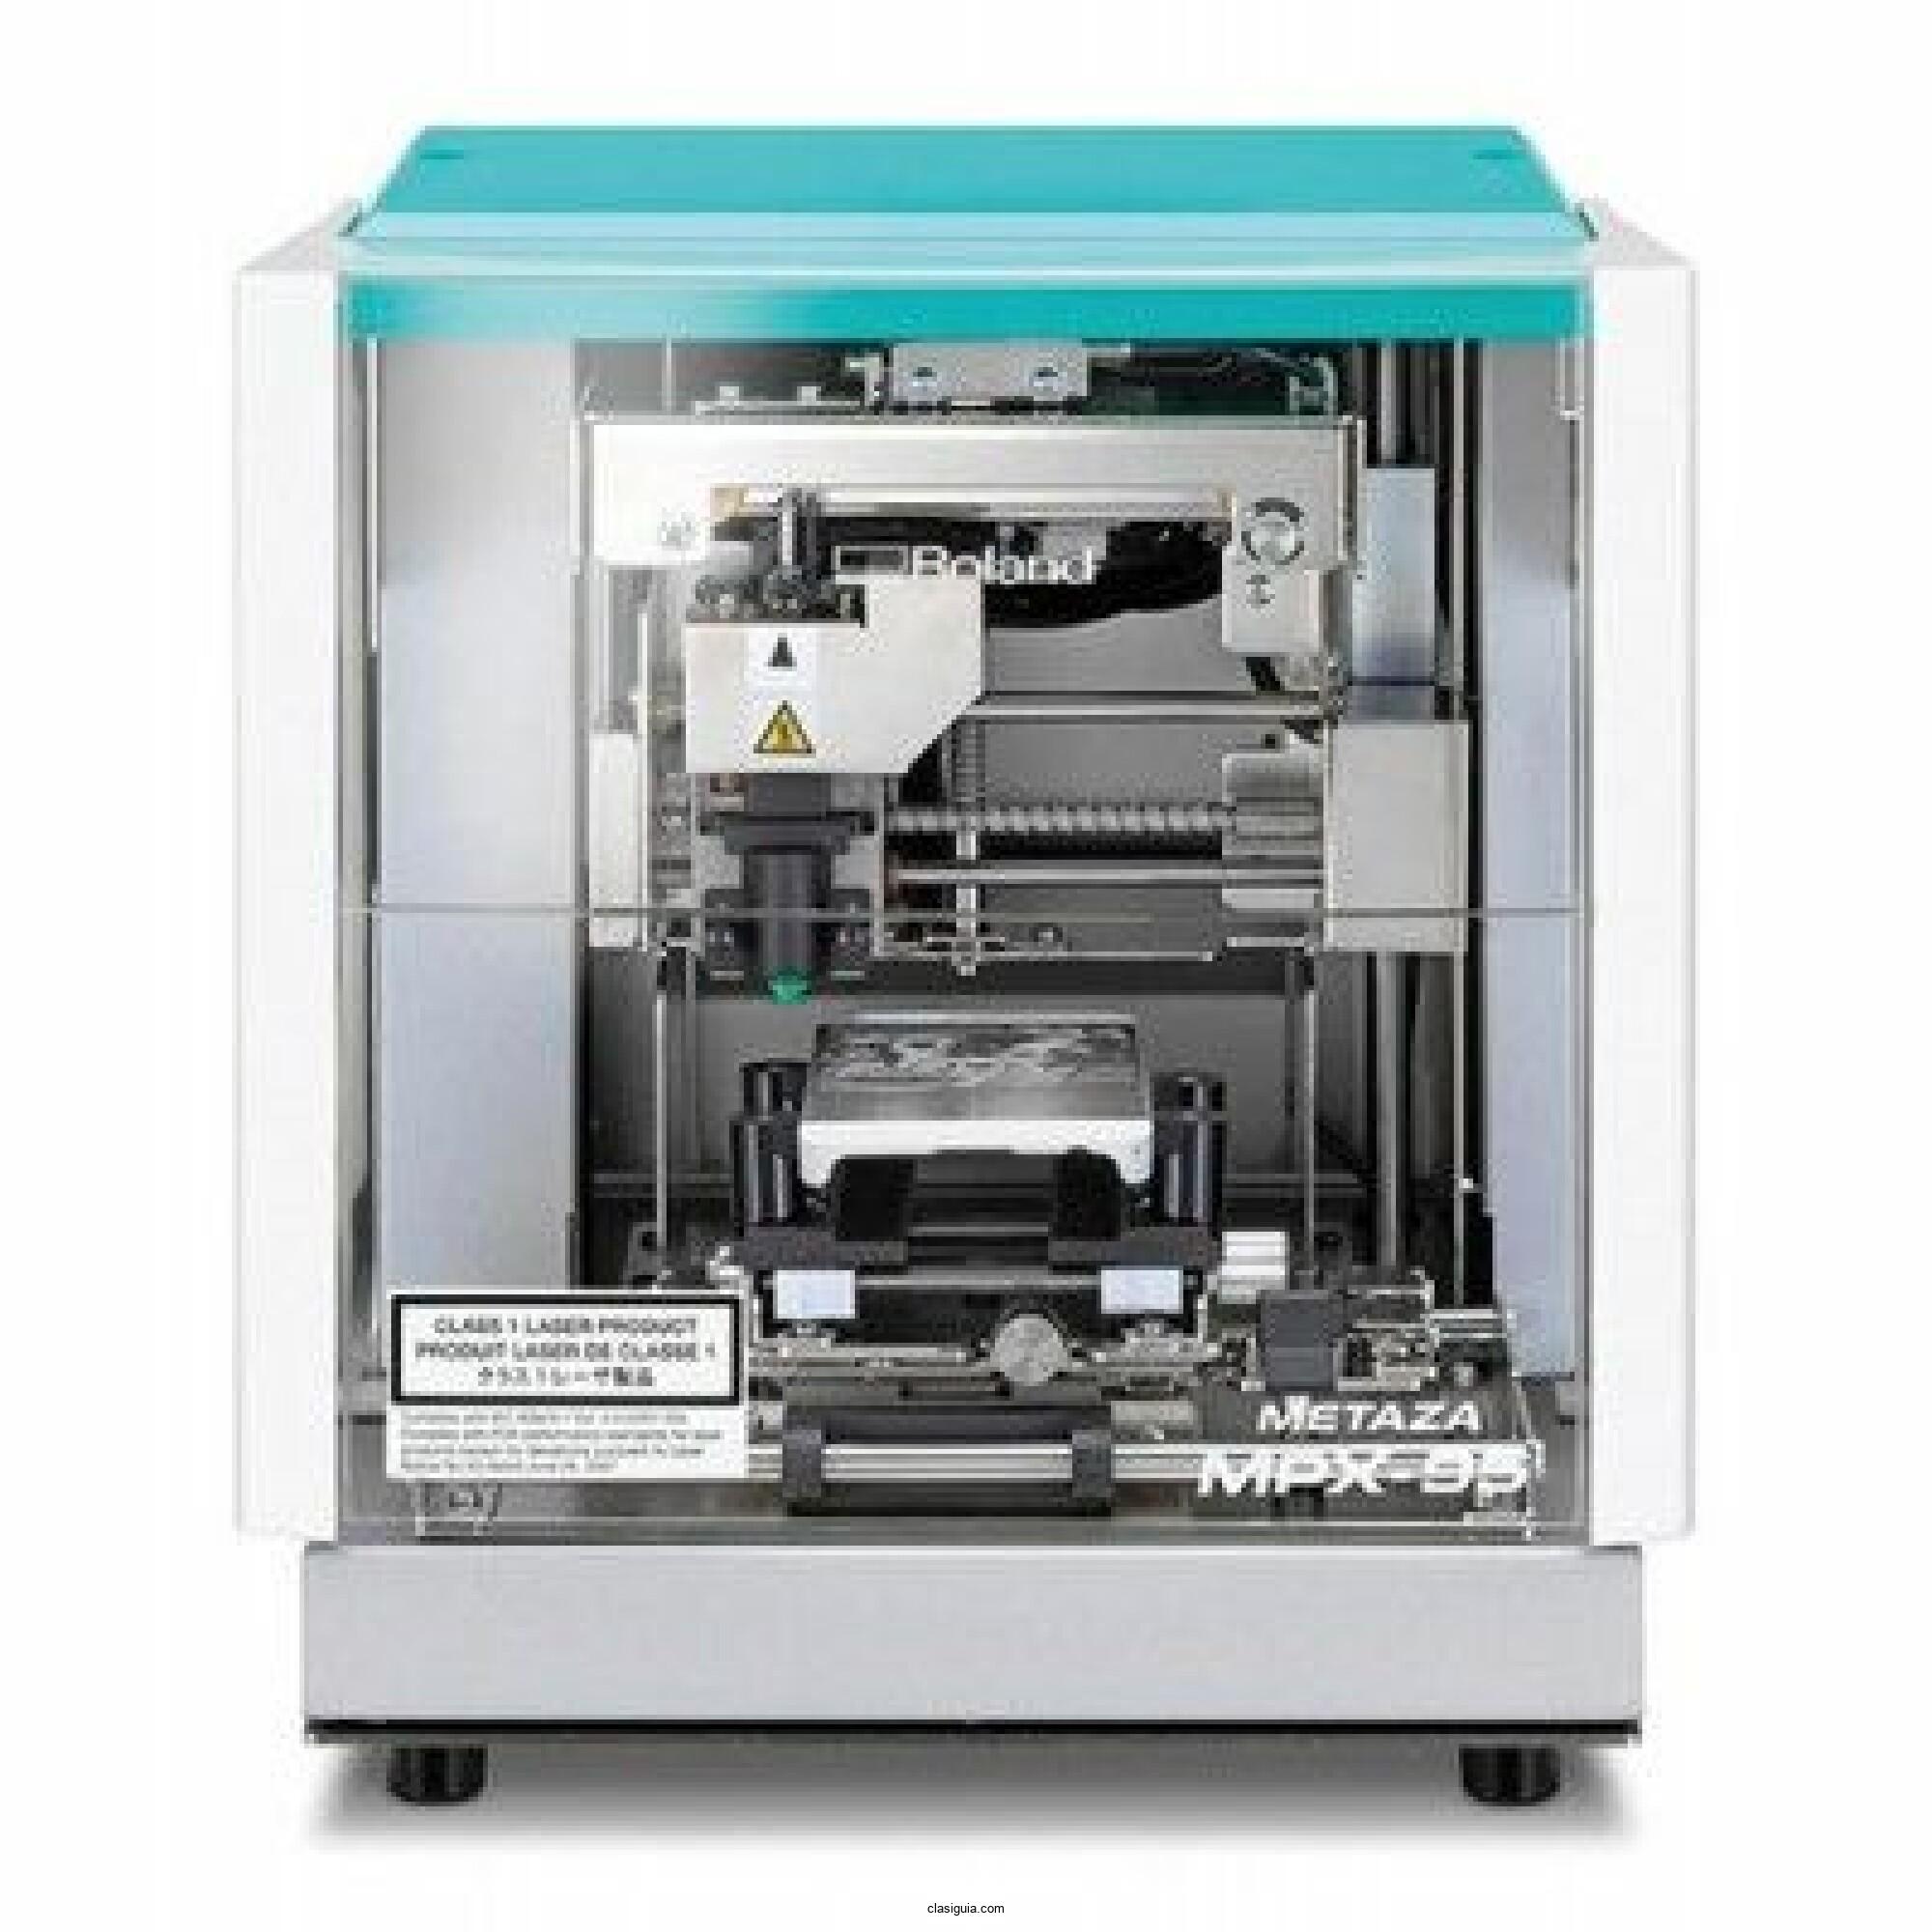 Roland Metaza MPX-95 Impact Printer with DPM Kit (MITRA PRINT)